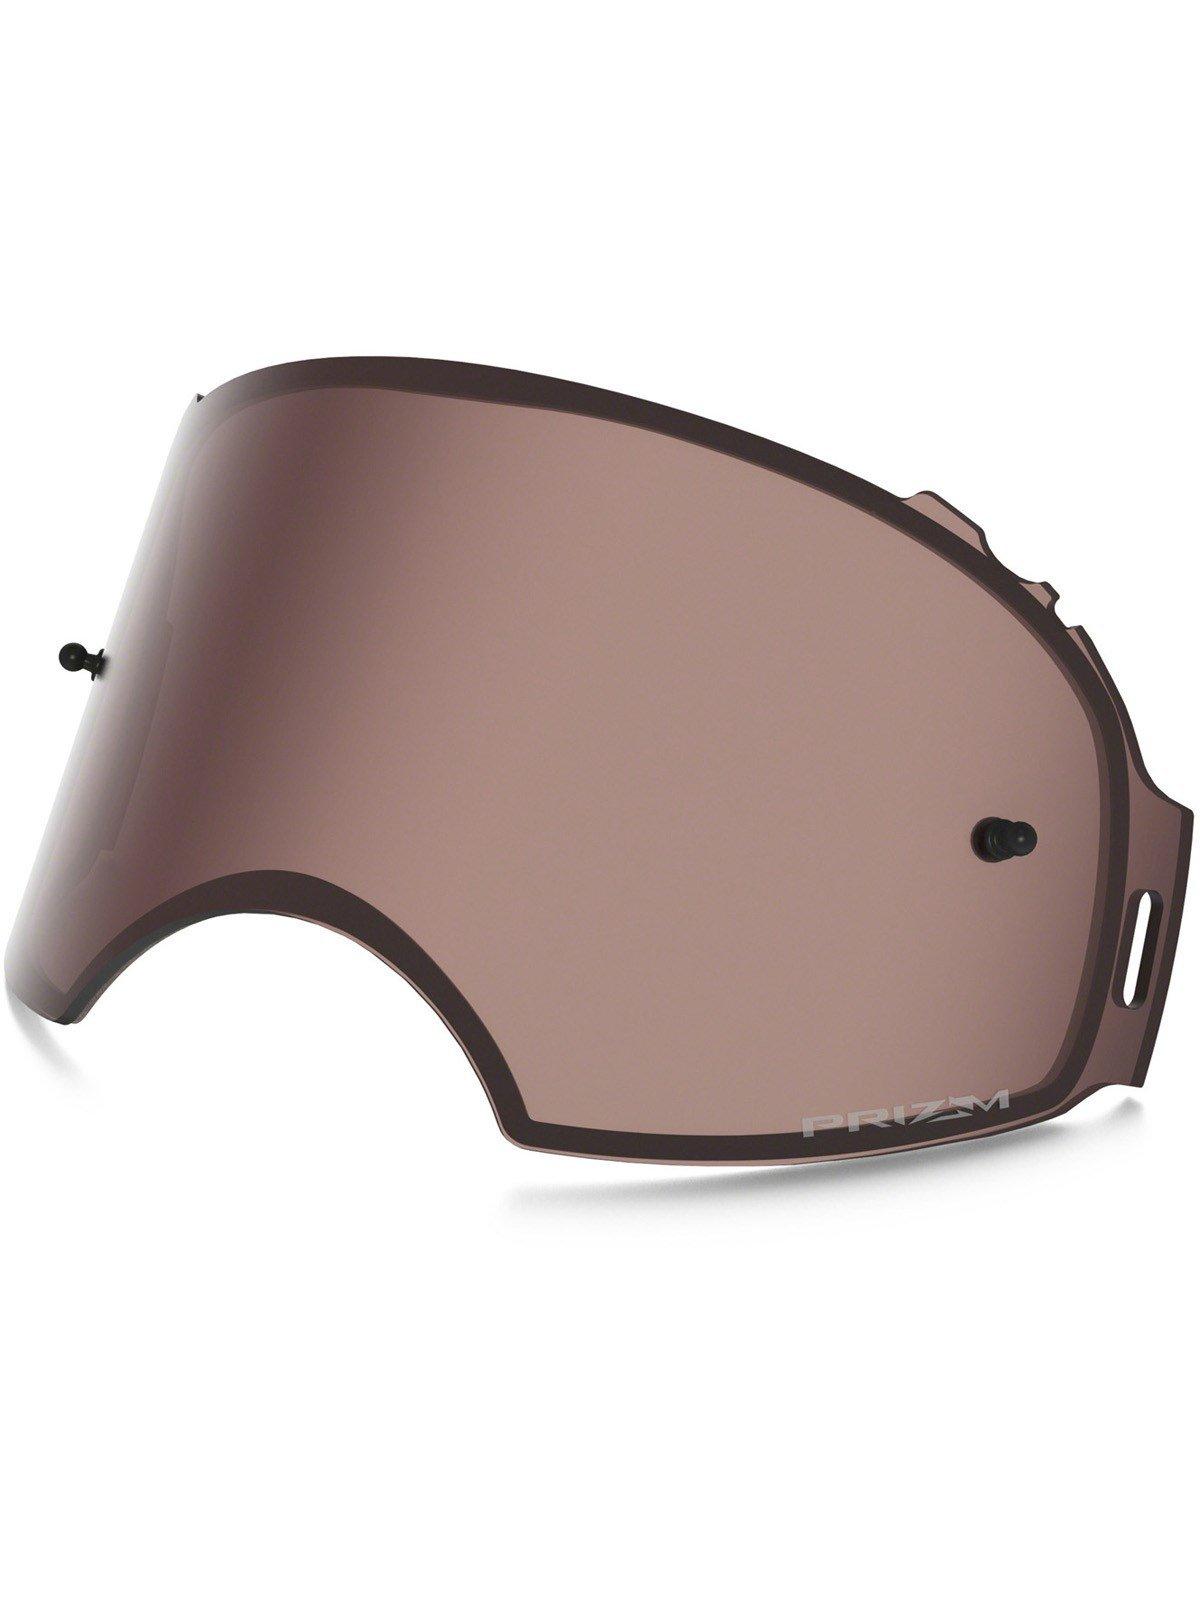 Oakley Unisex-Adult Goggle Replacement Len (Black, Medium)